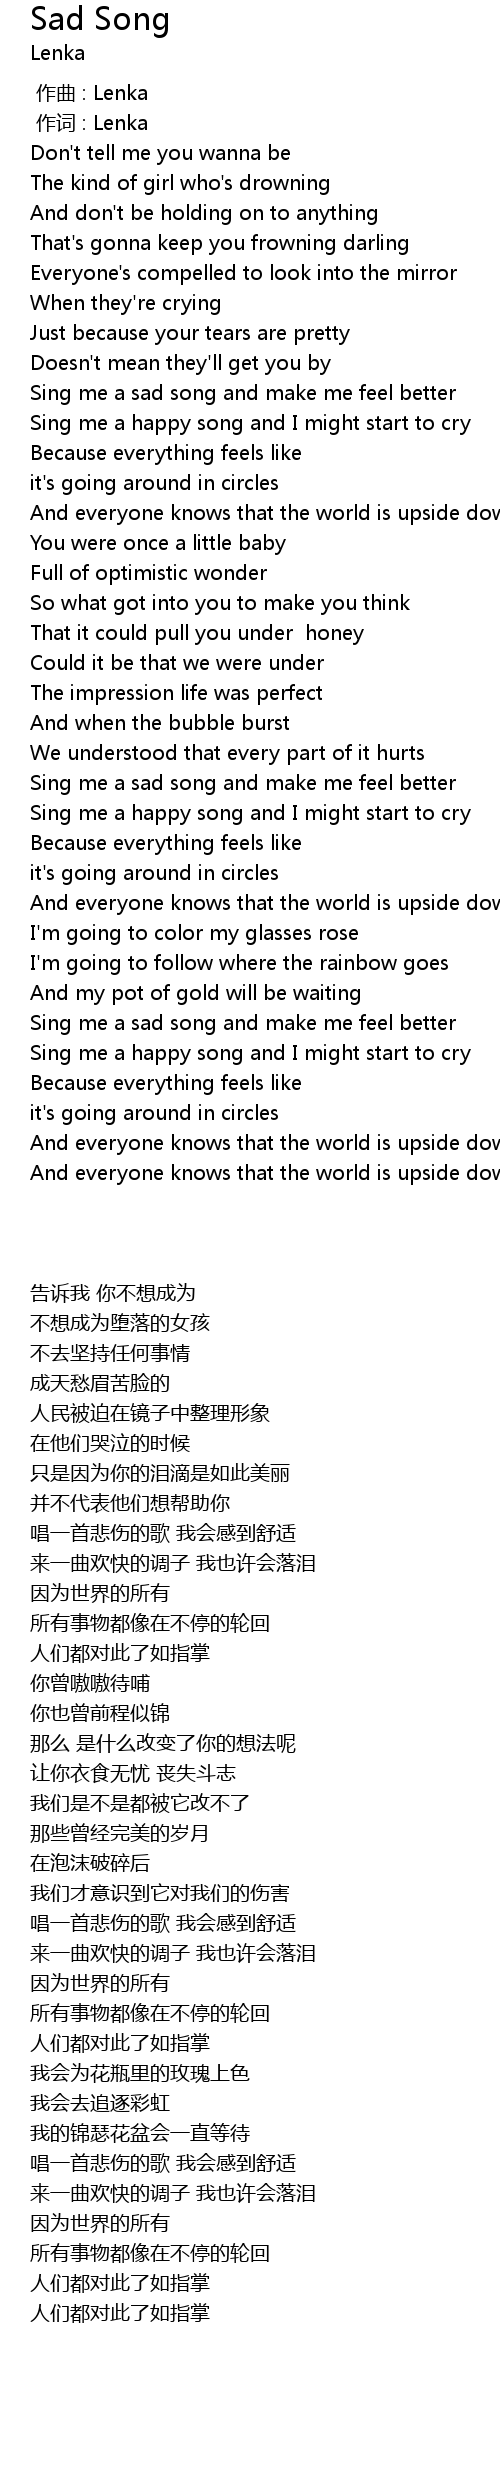 Song lyrics sad The 50